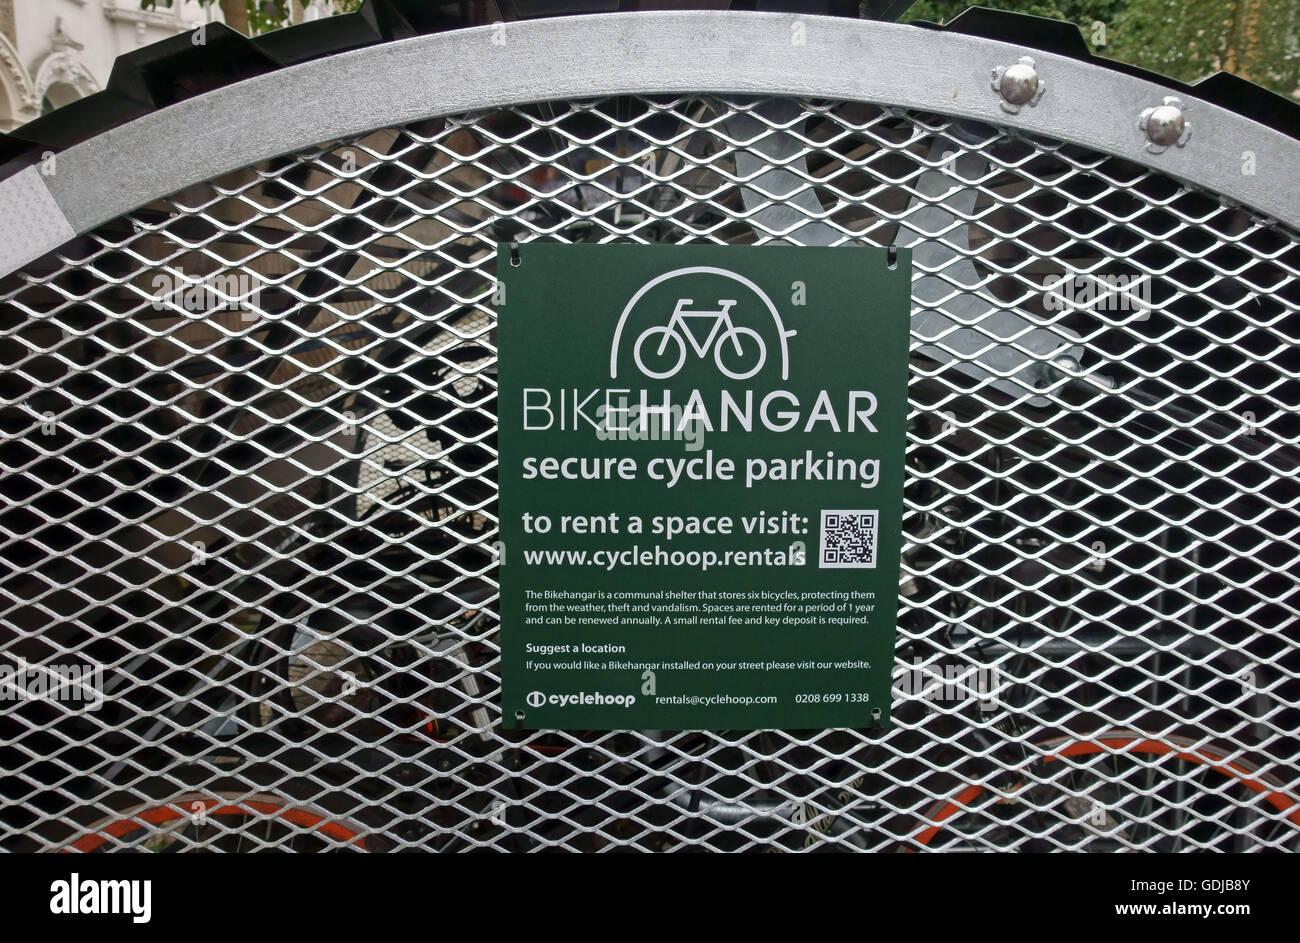 'Bikehangar' secure bicycle parking facility, Brixton, London - Stock Image